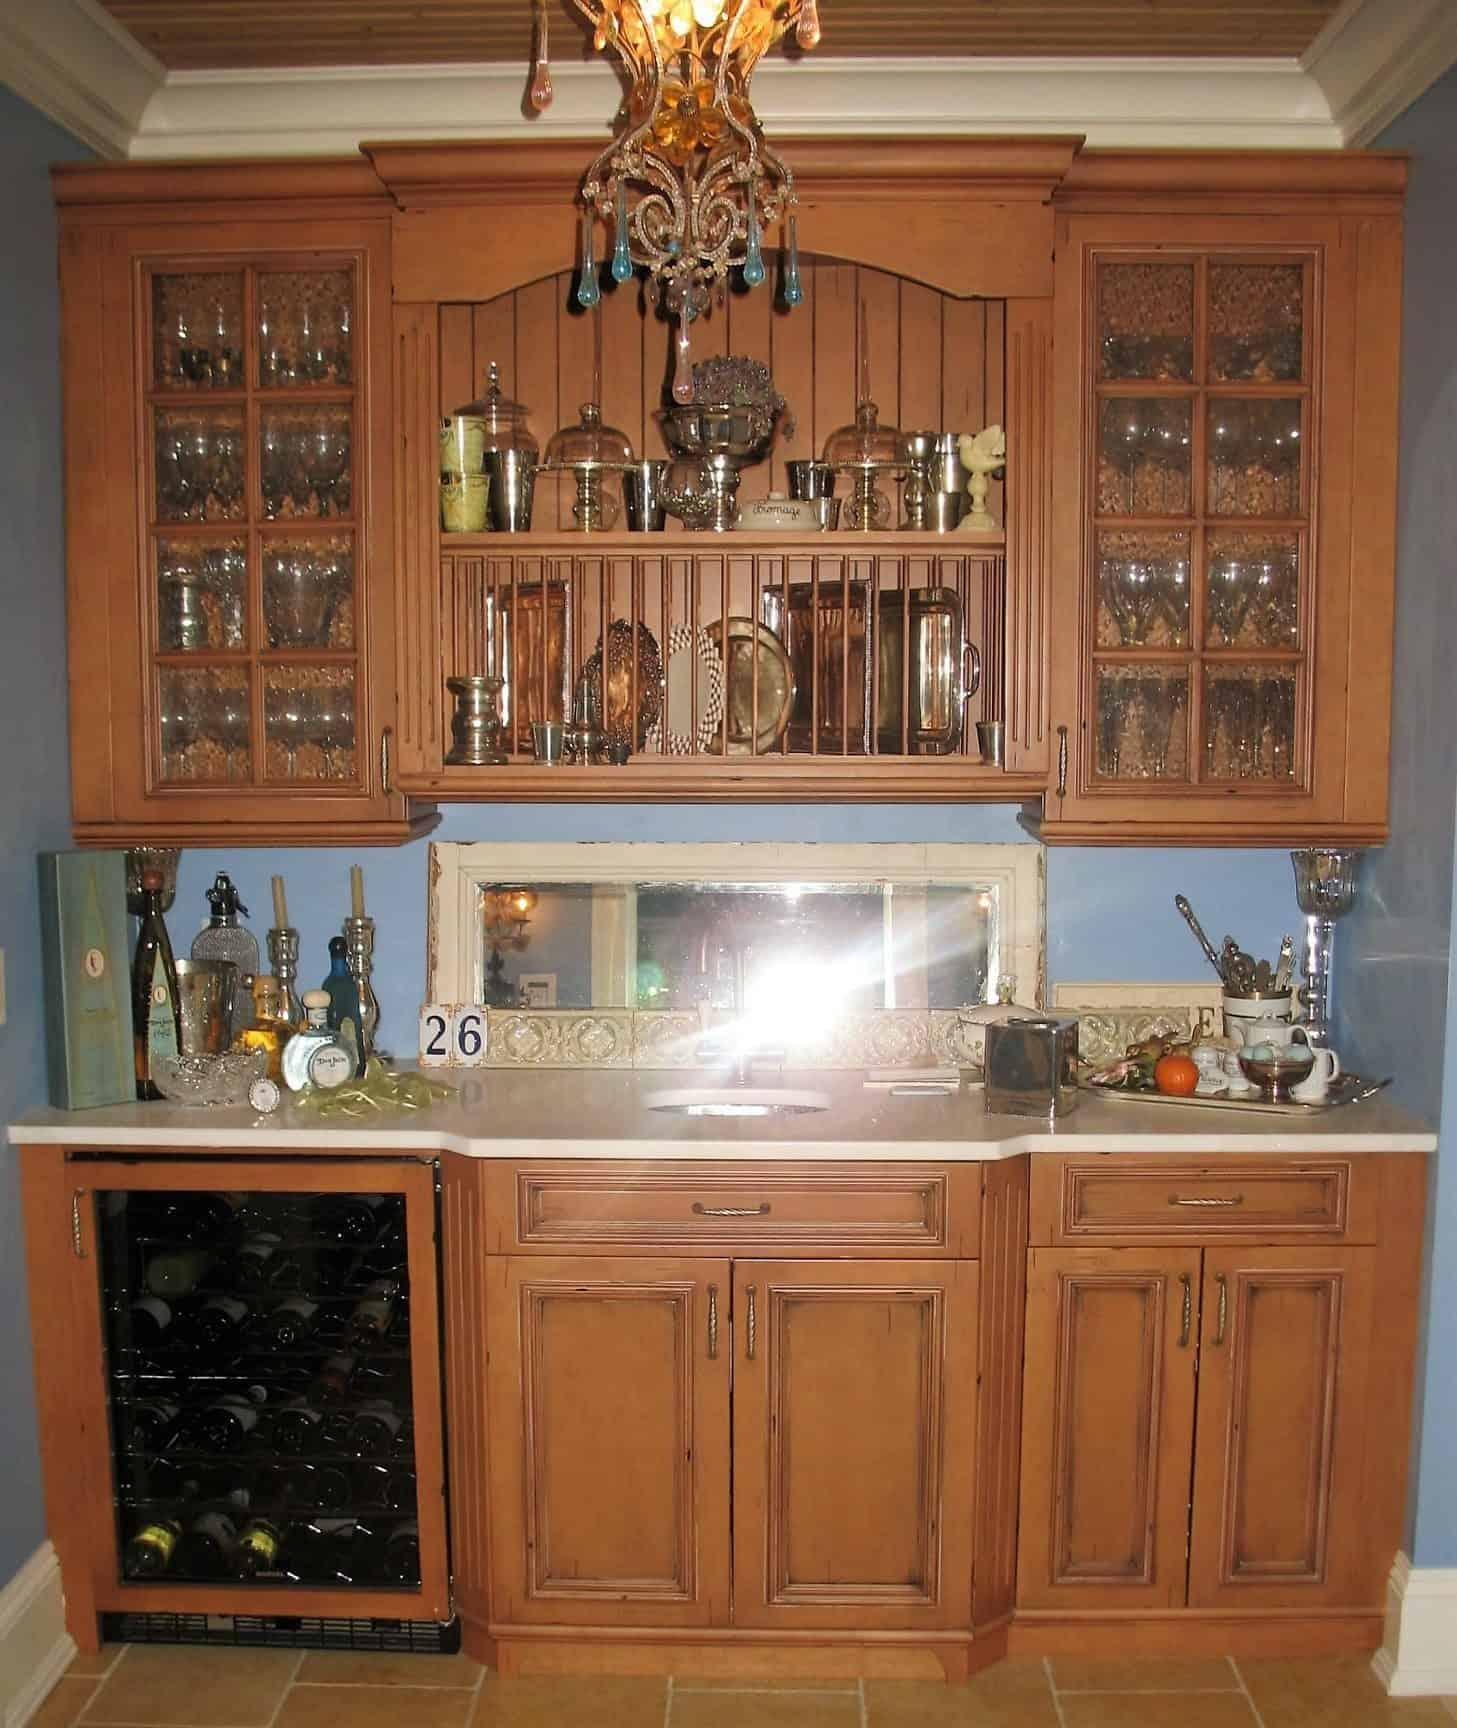 Custom Kitchen Cabinets Nj: Custom Kitchen Cabinets & Bathroom Vanities